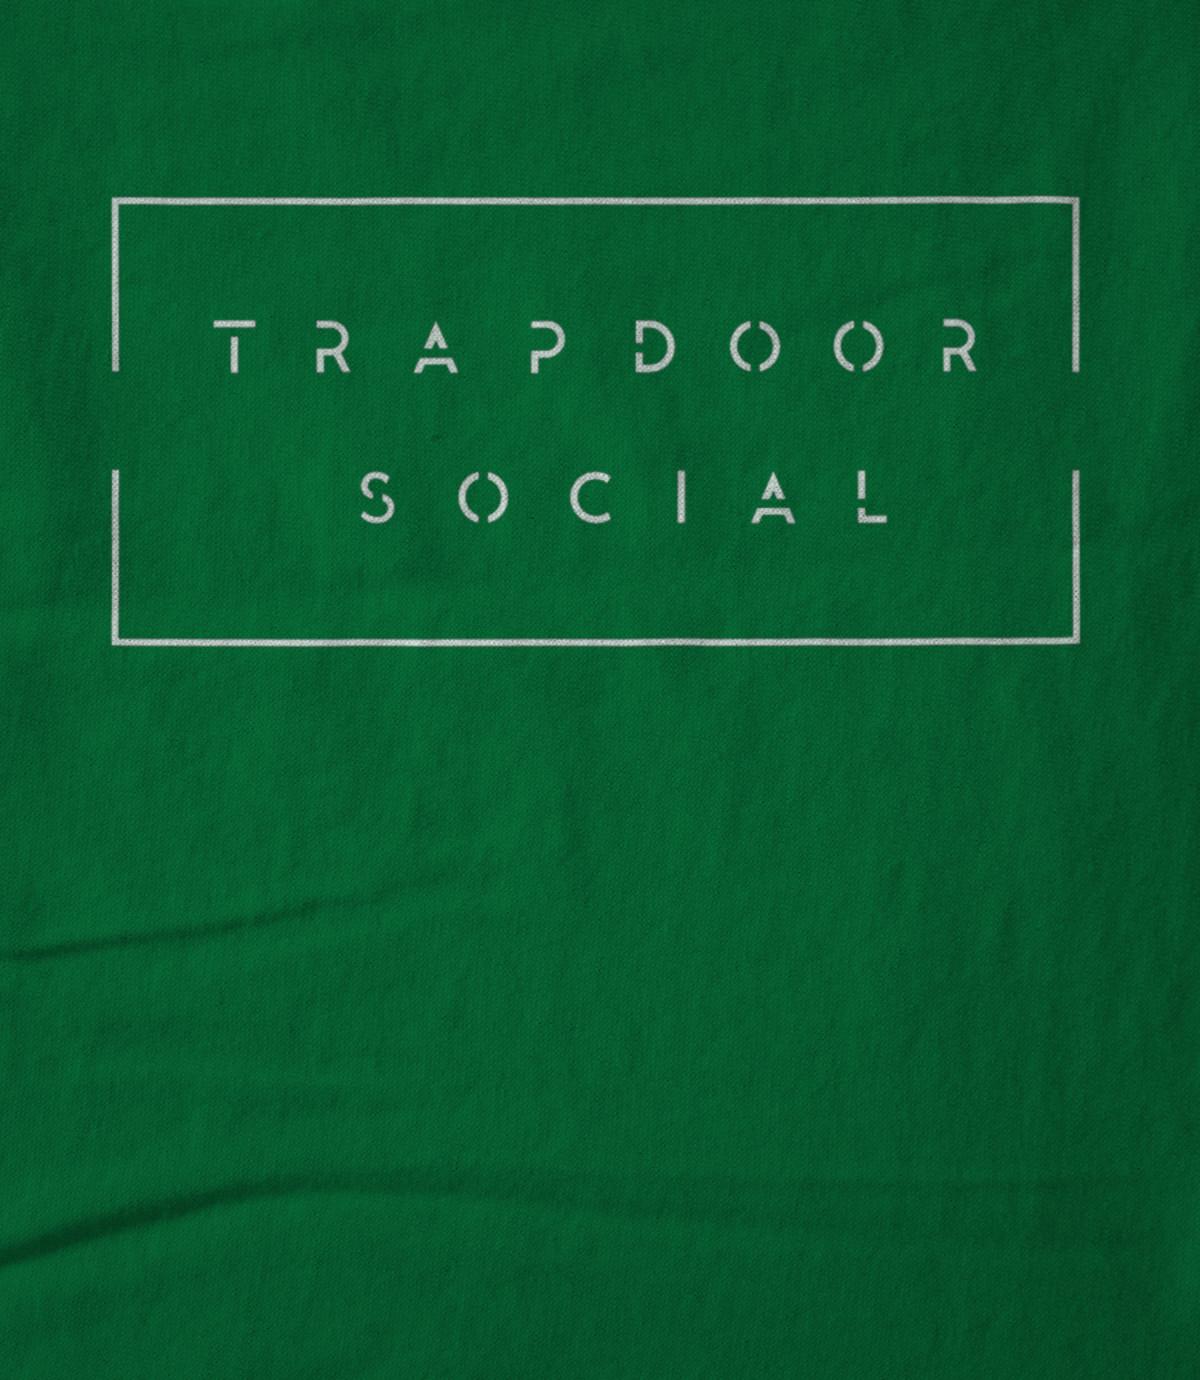 Trapdoor social black band logo 1476401243